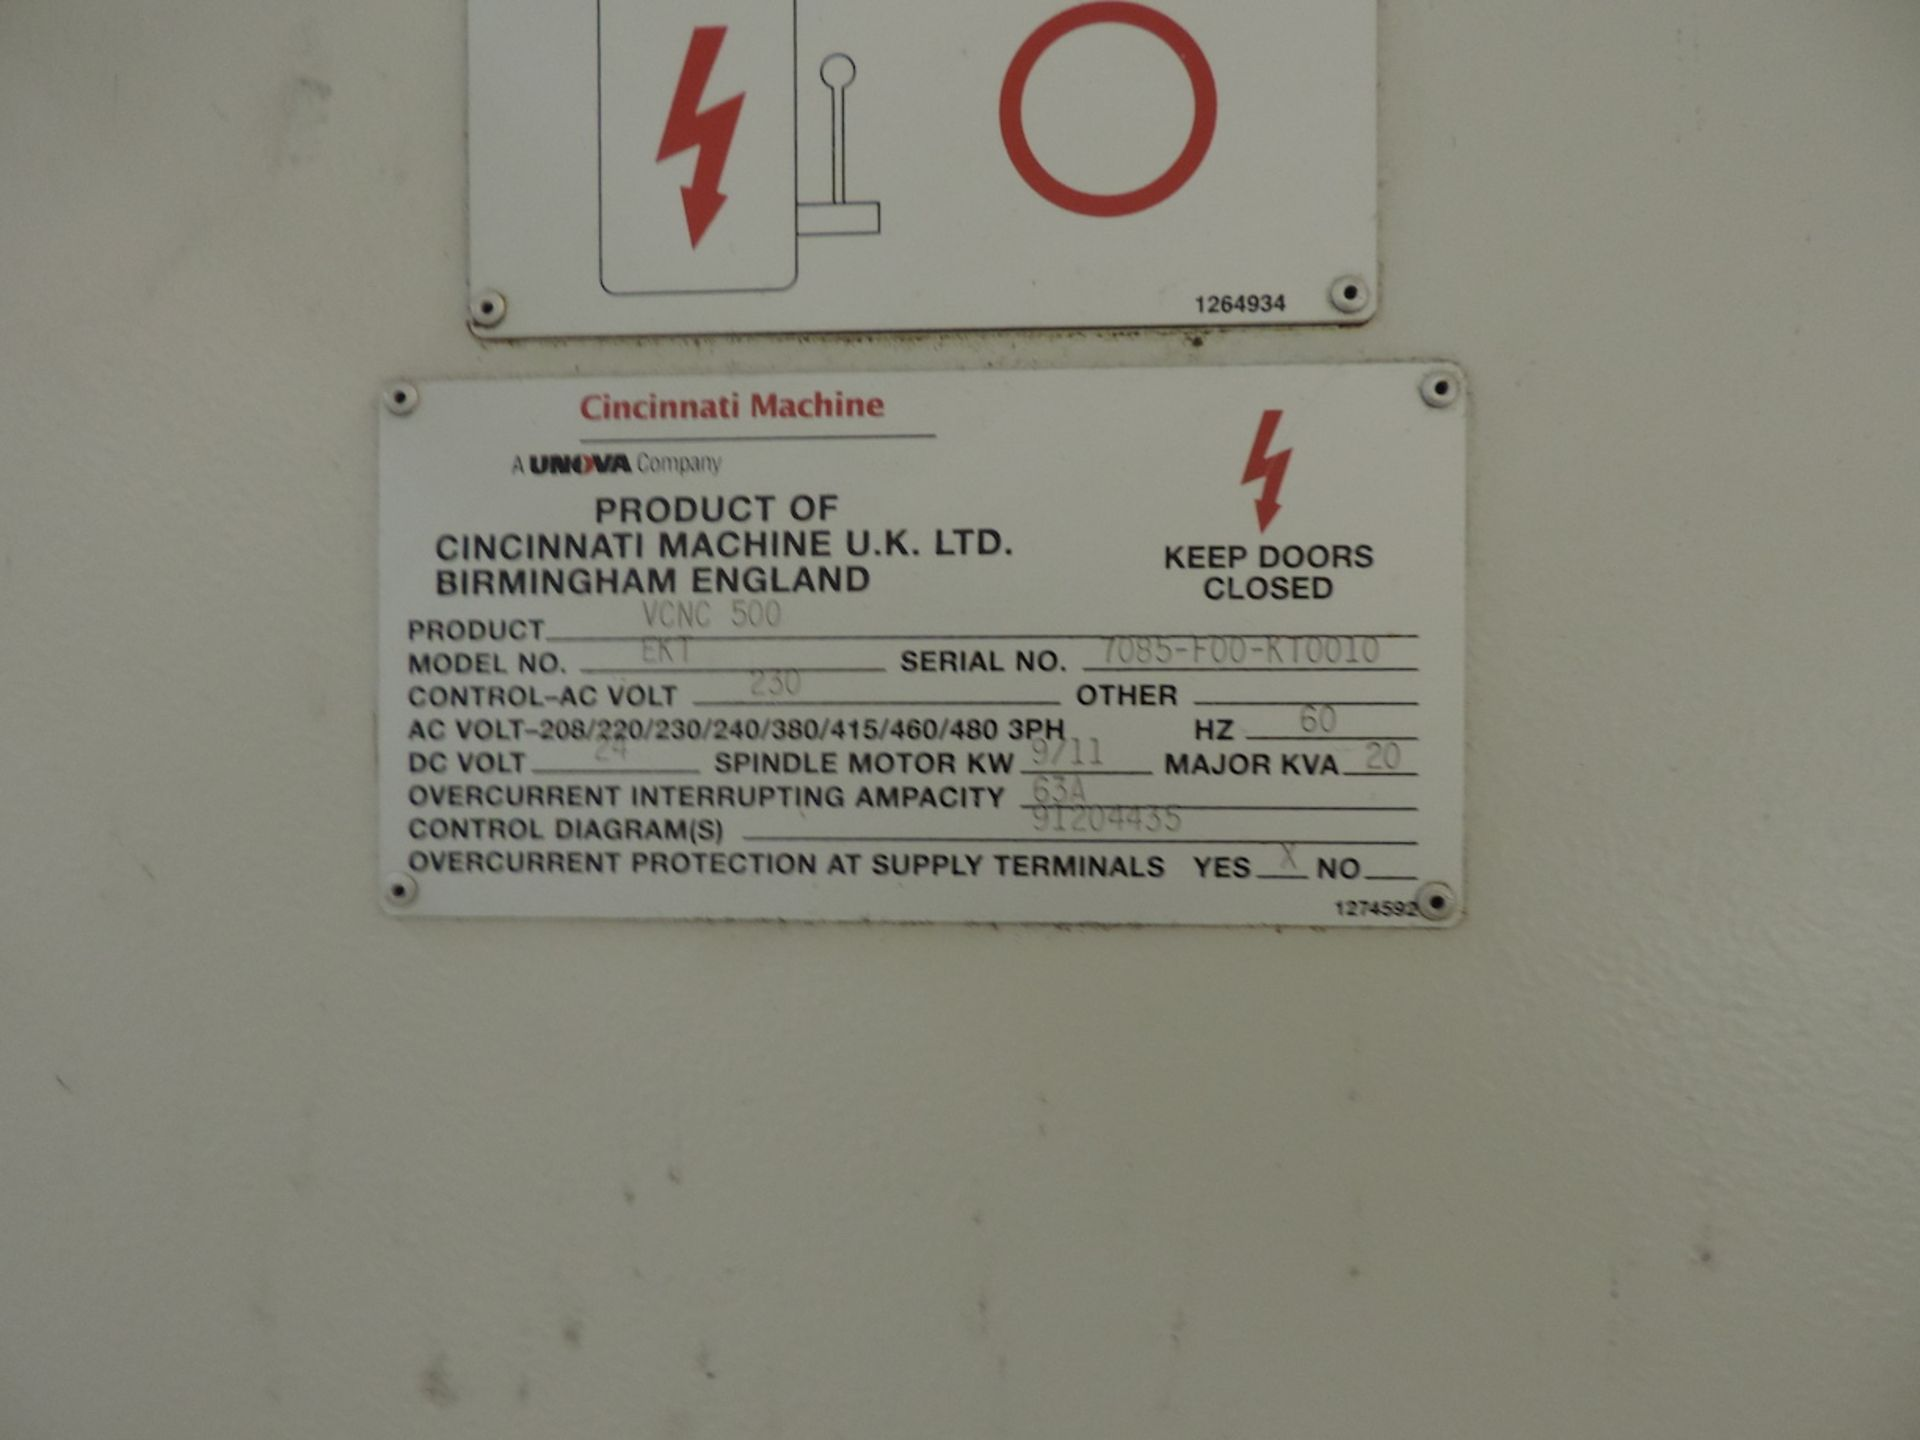 "CINCINNATI VCNC 500 VMC, F00-K10010 GE FANUC 21 I-MB CONTROL, XYZ TRAVELS: 20"" X 20"" X 20"" , 27"" X - Image 10 of 13"